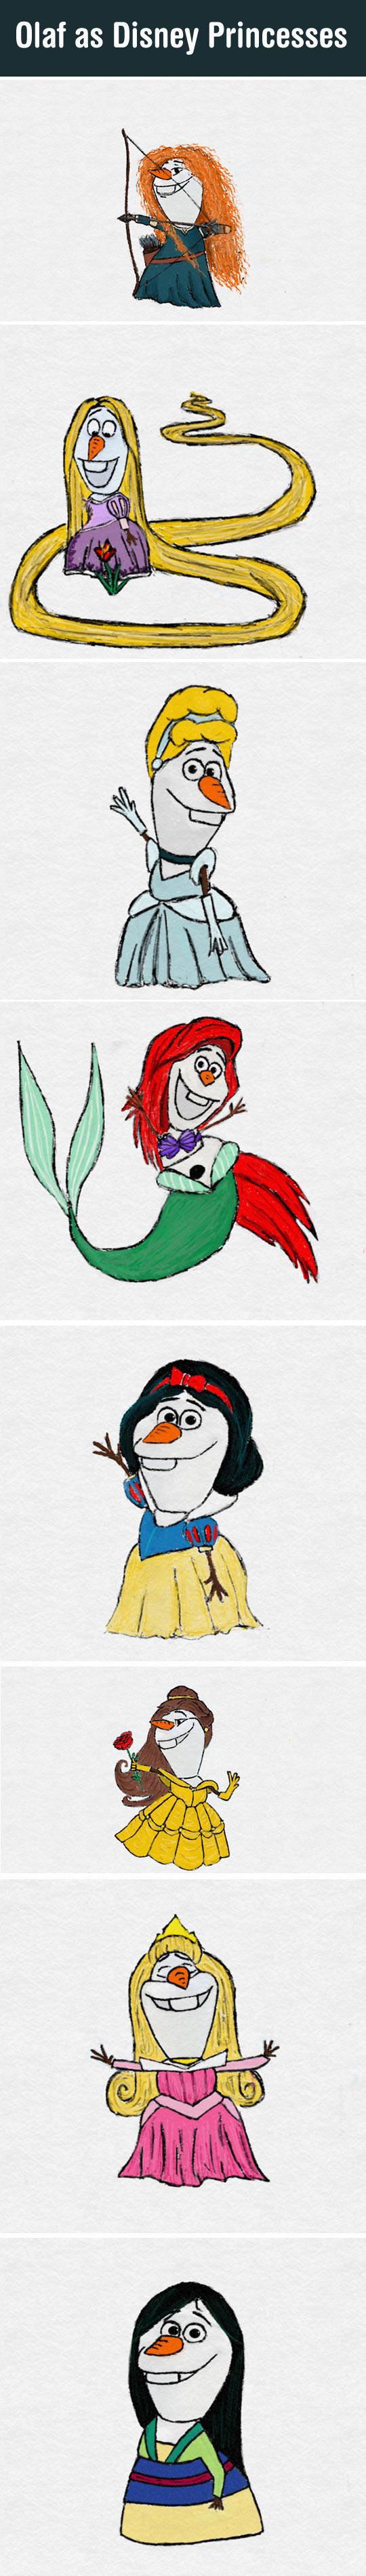 If Olaf Was Actually A Disney Princess